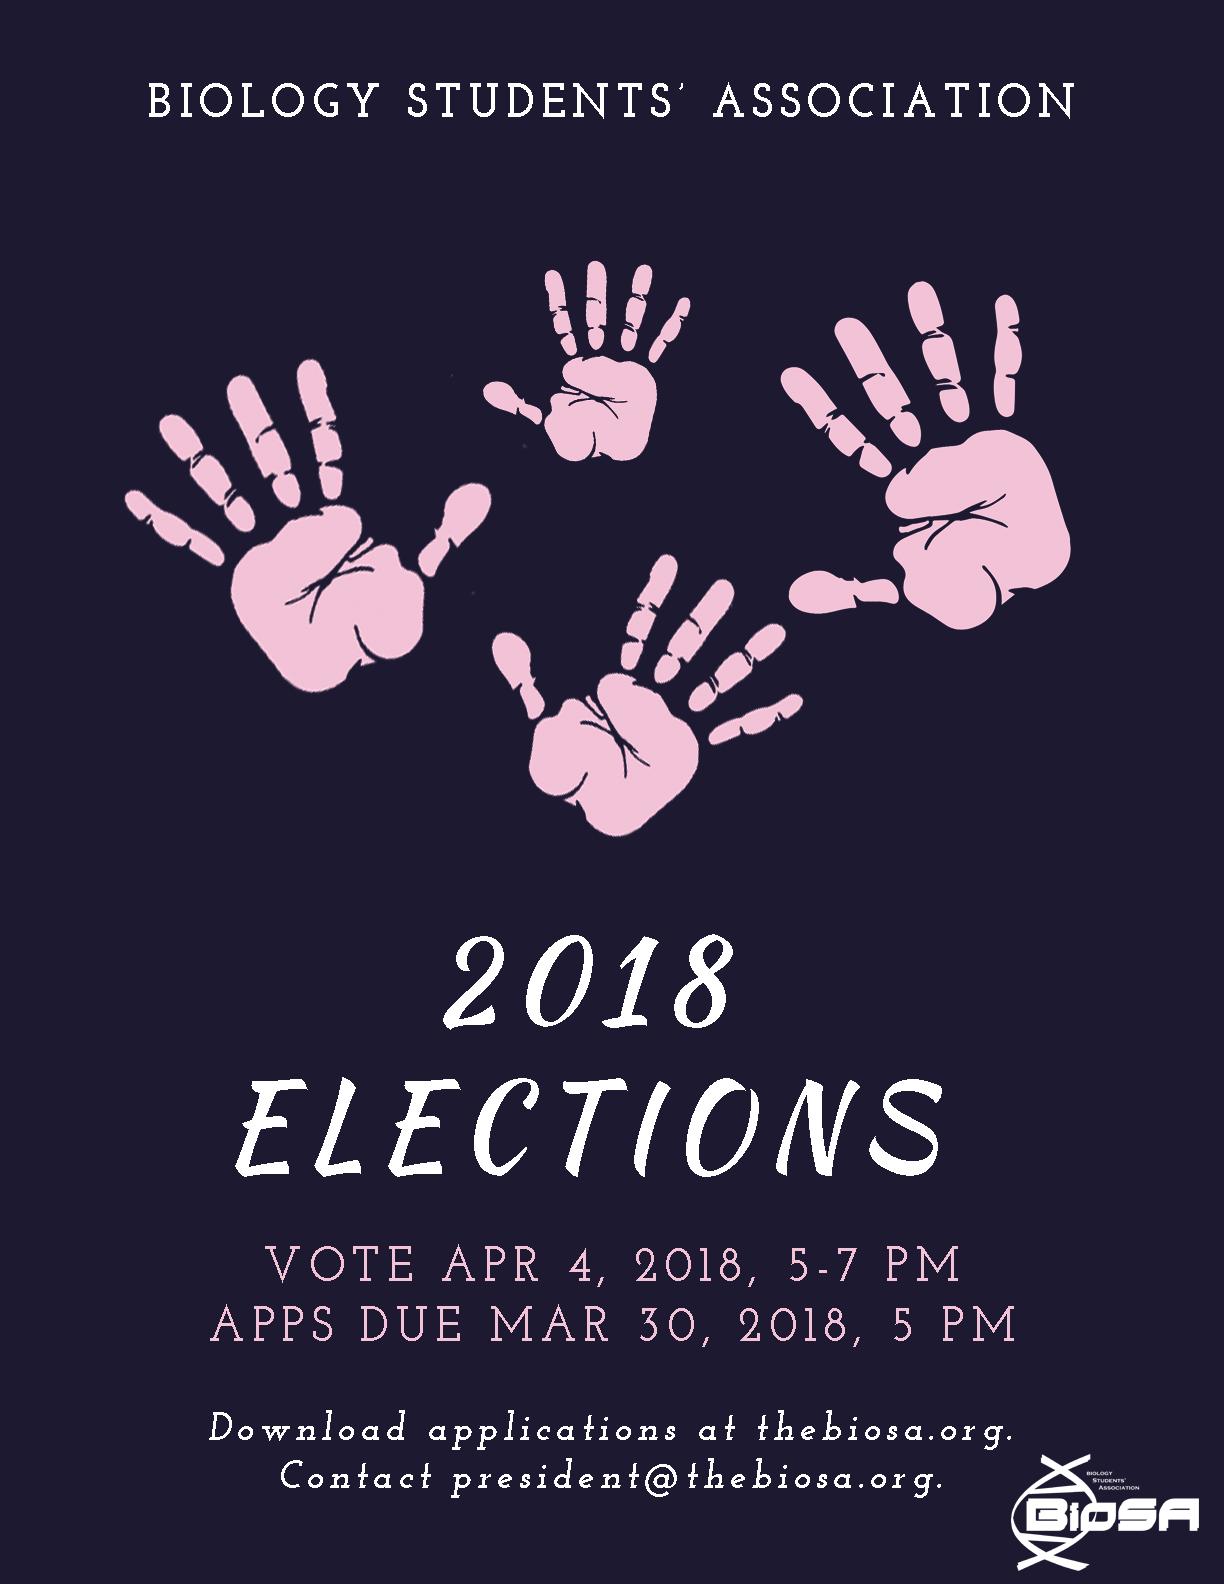 Biosa elections